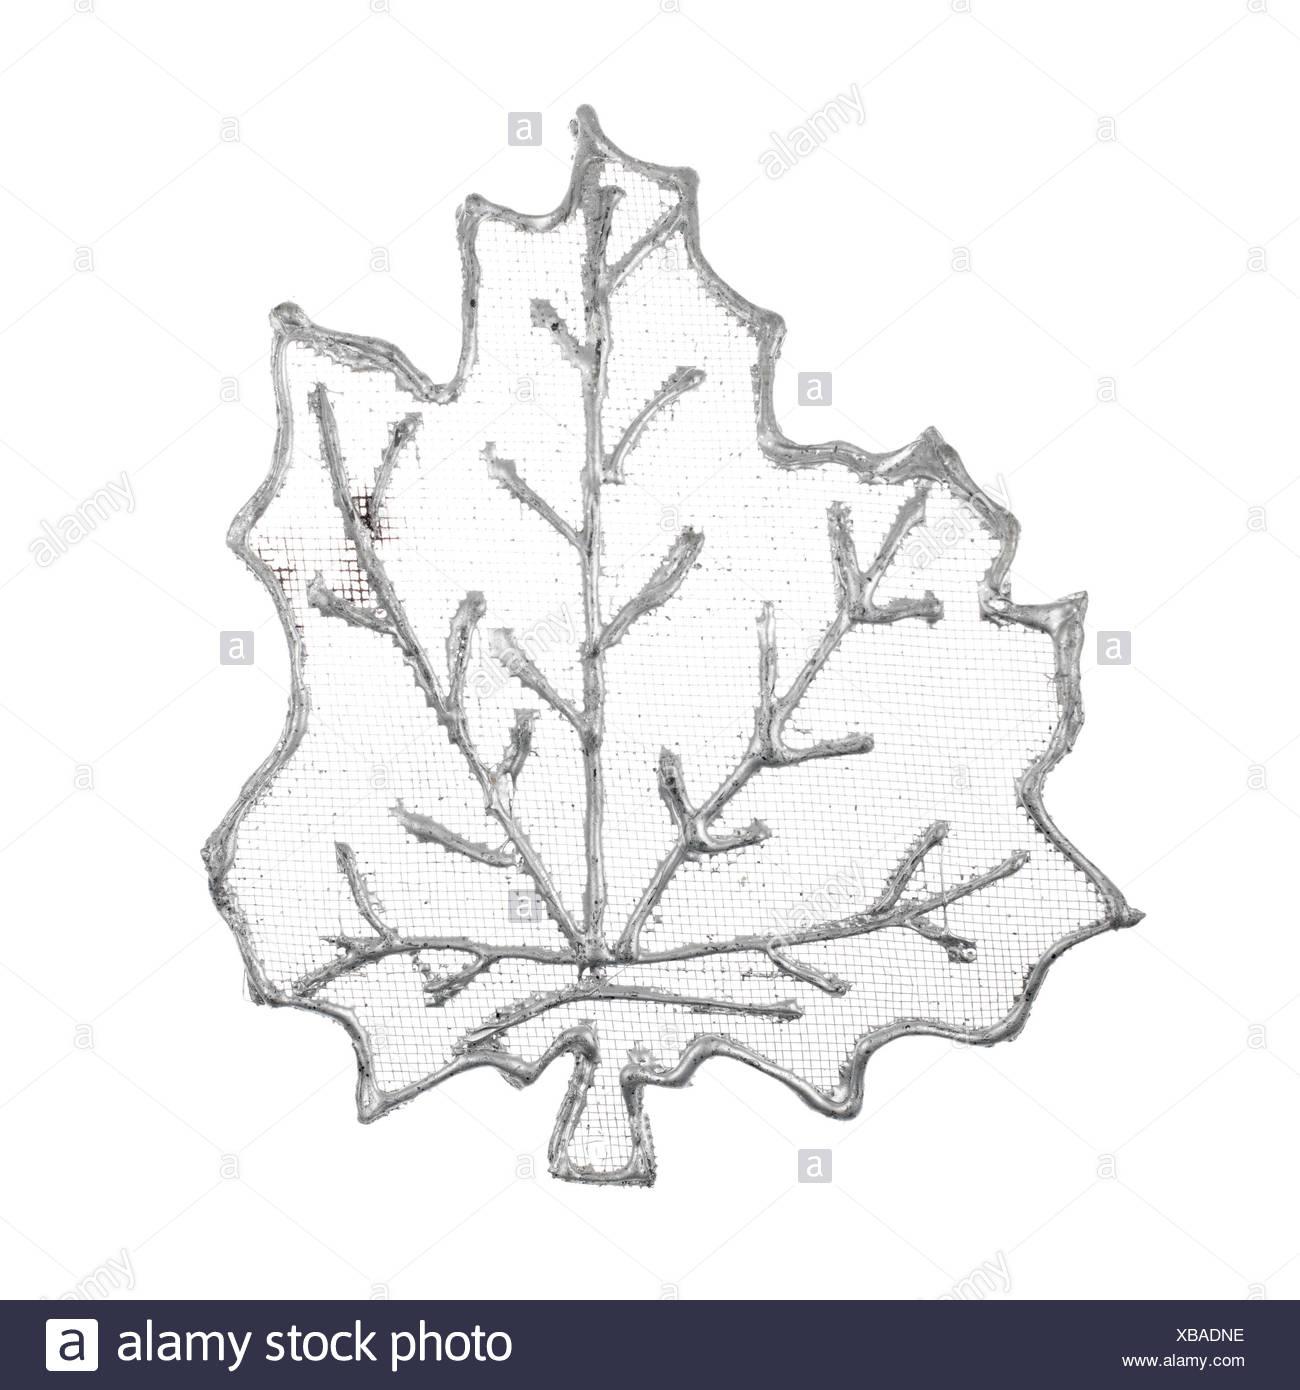 Christmas decorative silver leaf - Stock Image